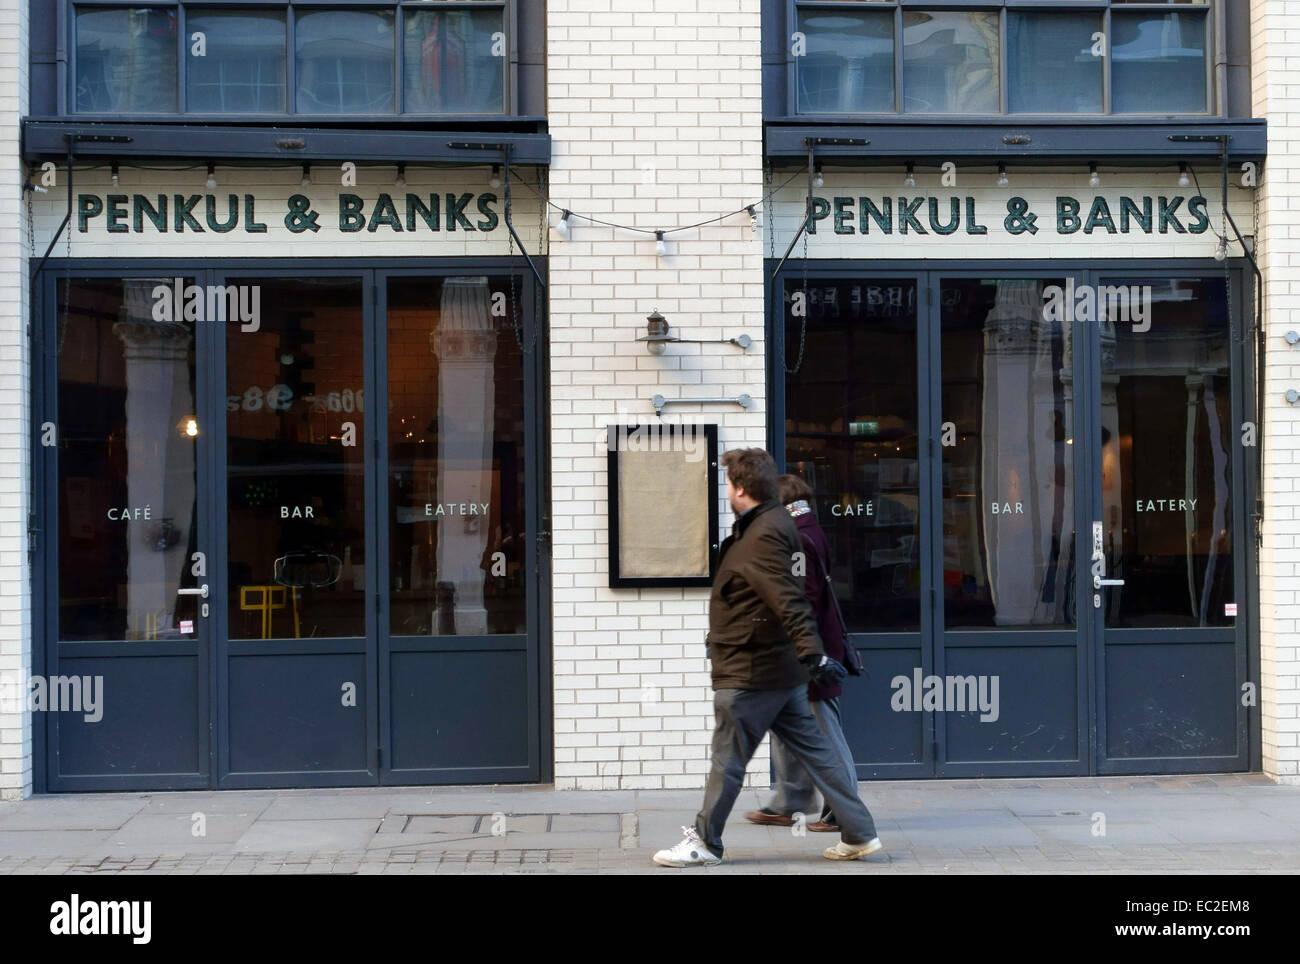 Penkul & Banks tapas style restaurant, Shoreditch, London - Stock Image